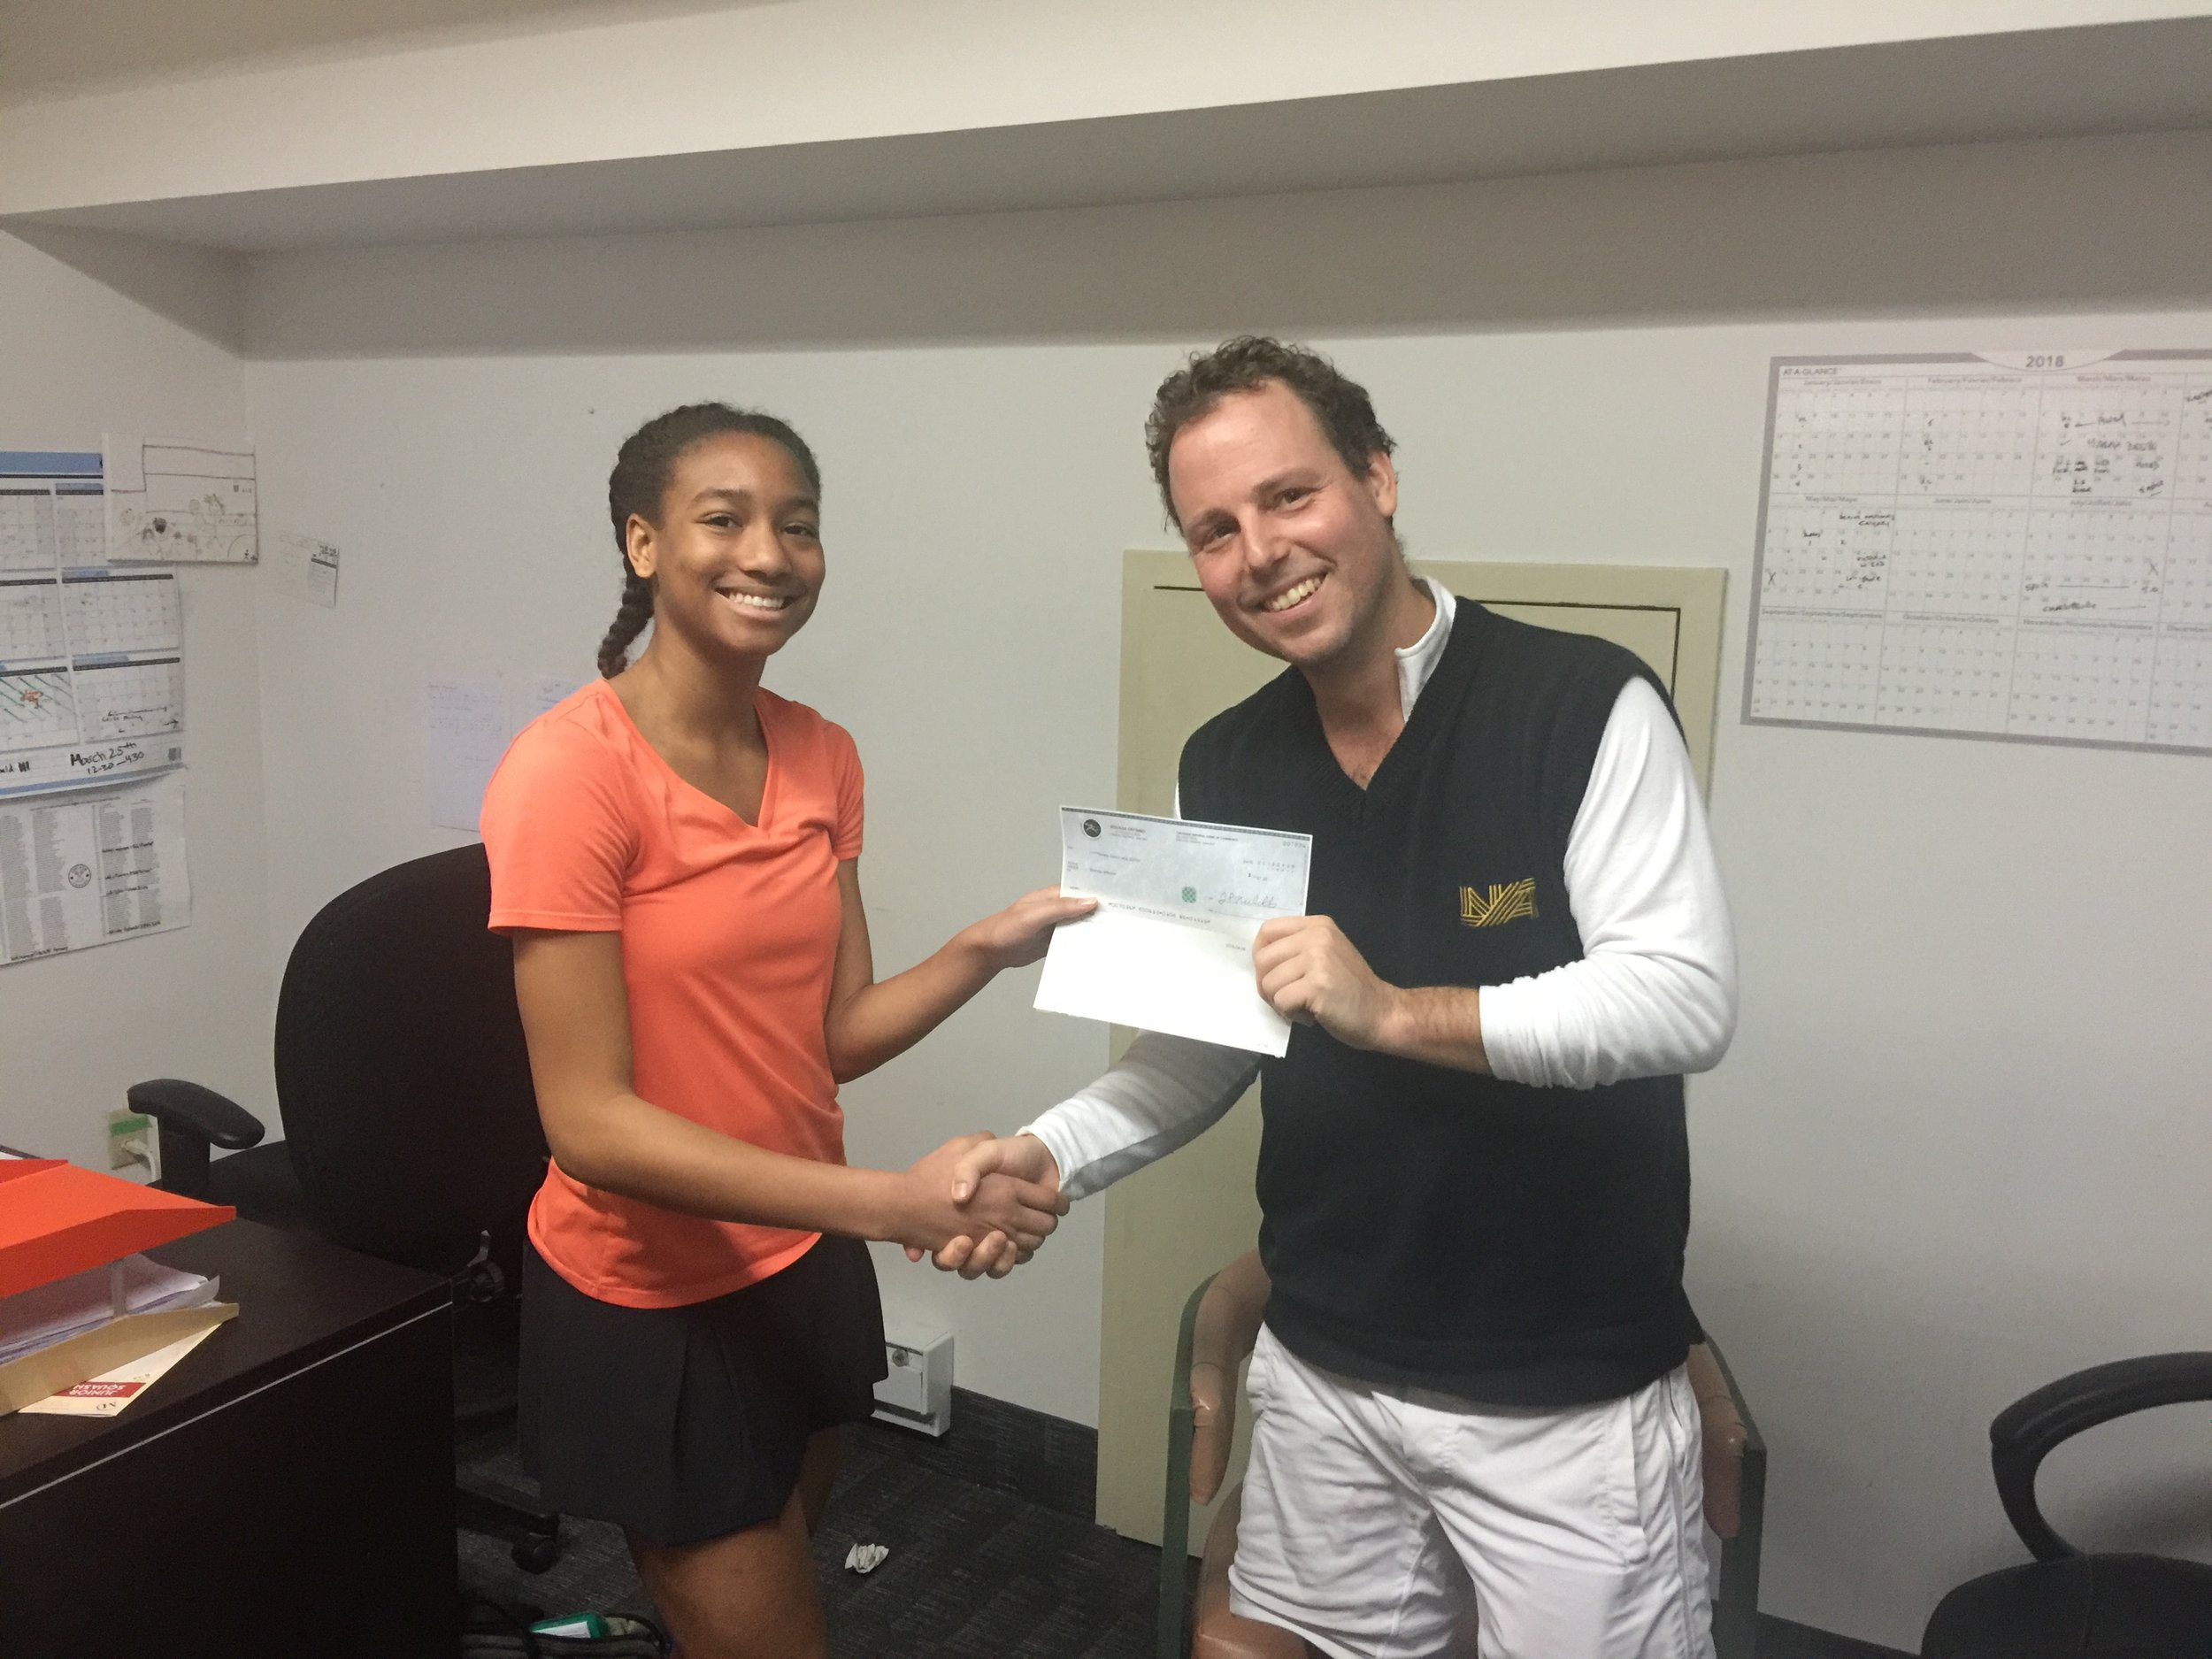 Brianna Jefferson, Women's Open Consolation Winner with Squash Ontario's Jamie Nicholls